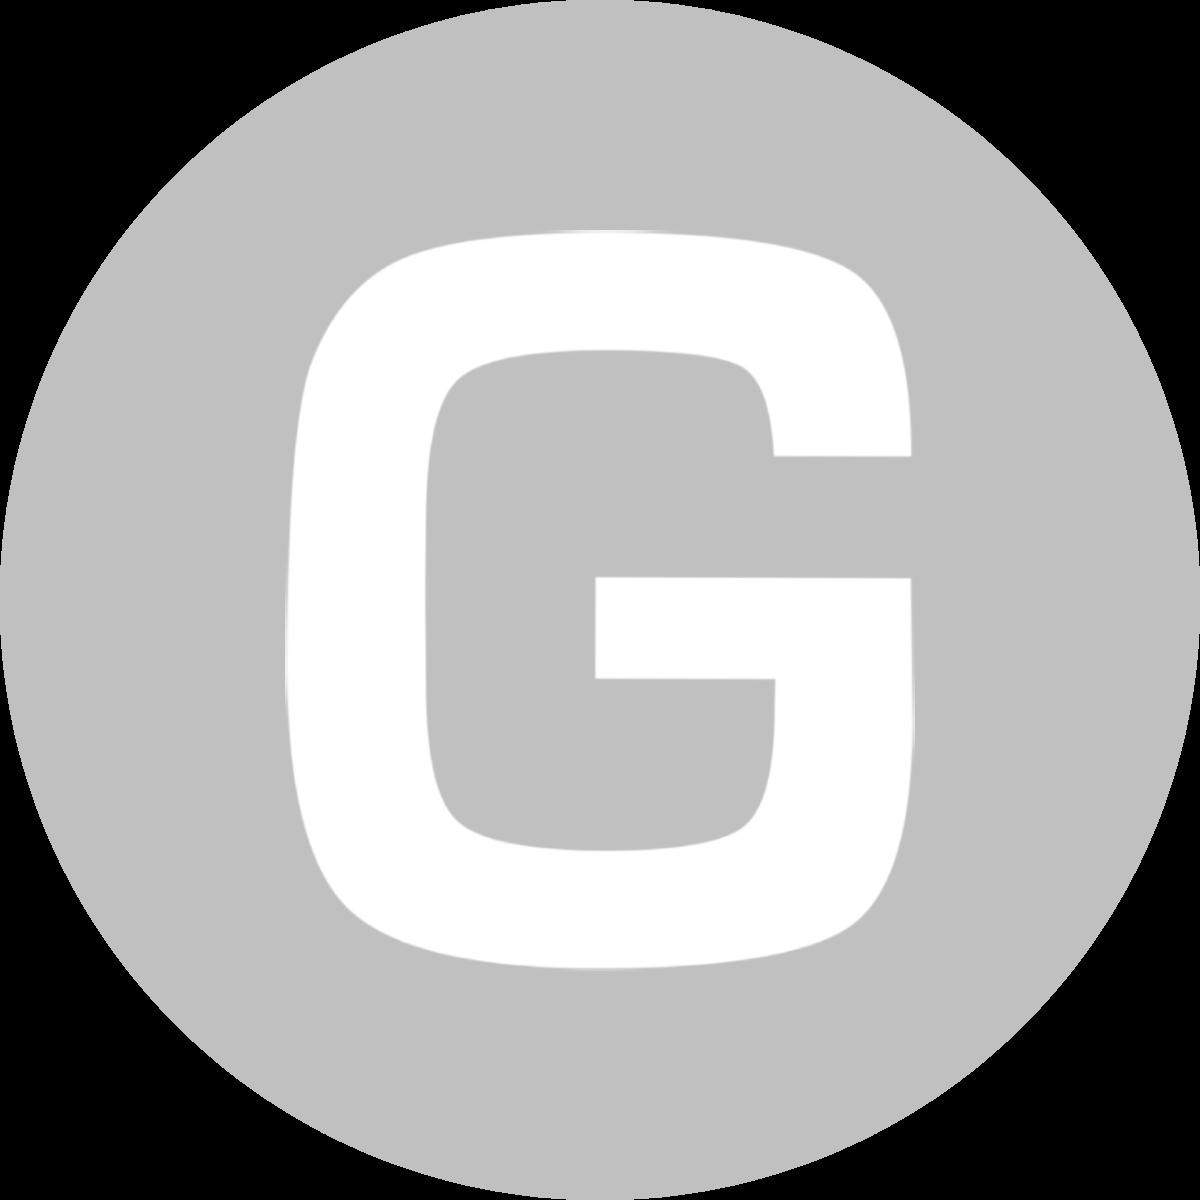 Nike Caps Aerobill Classic 99 Oransje/Hvit